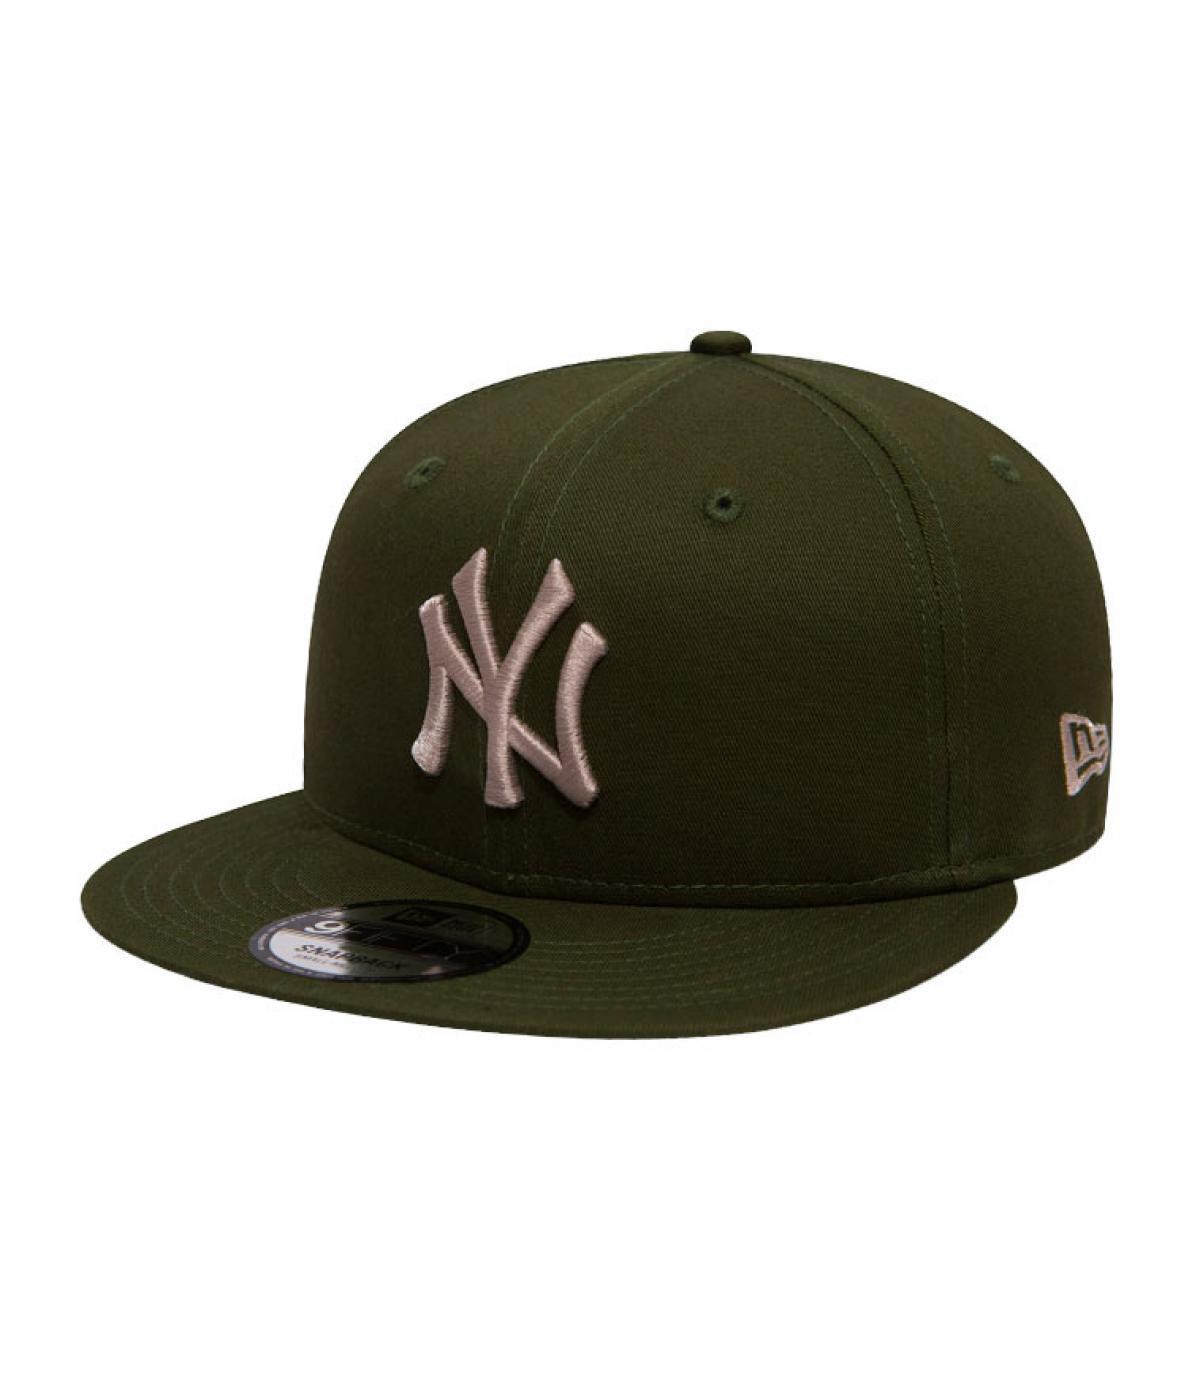 Dettagli League Ess 9Fifty NY rifle green stone - image 2